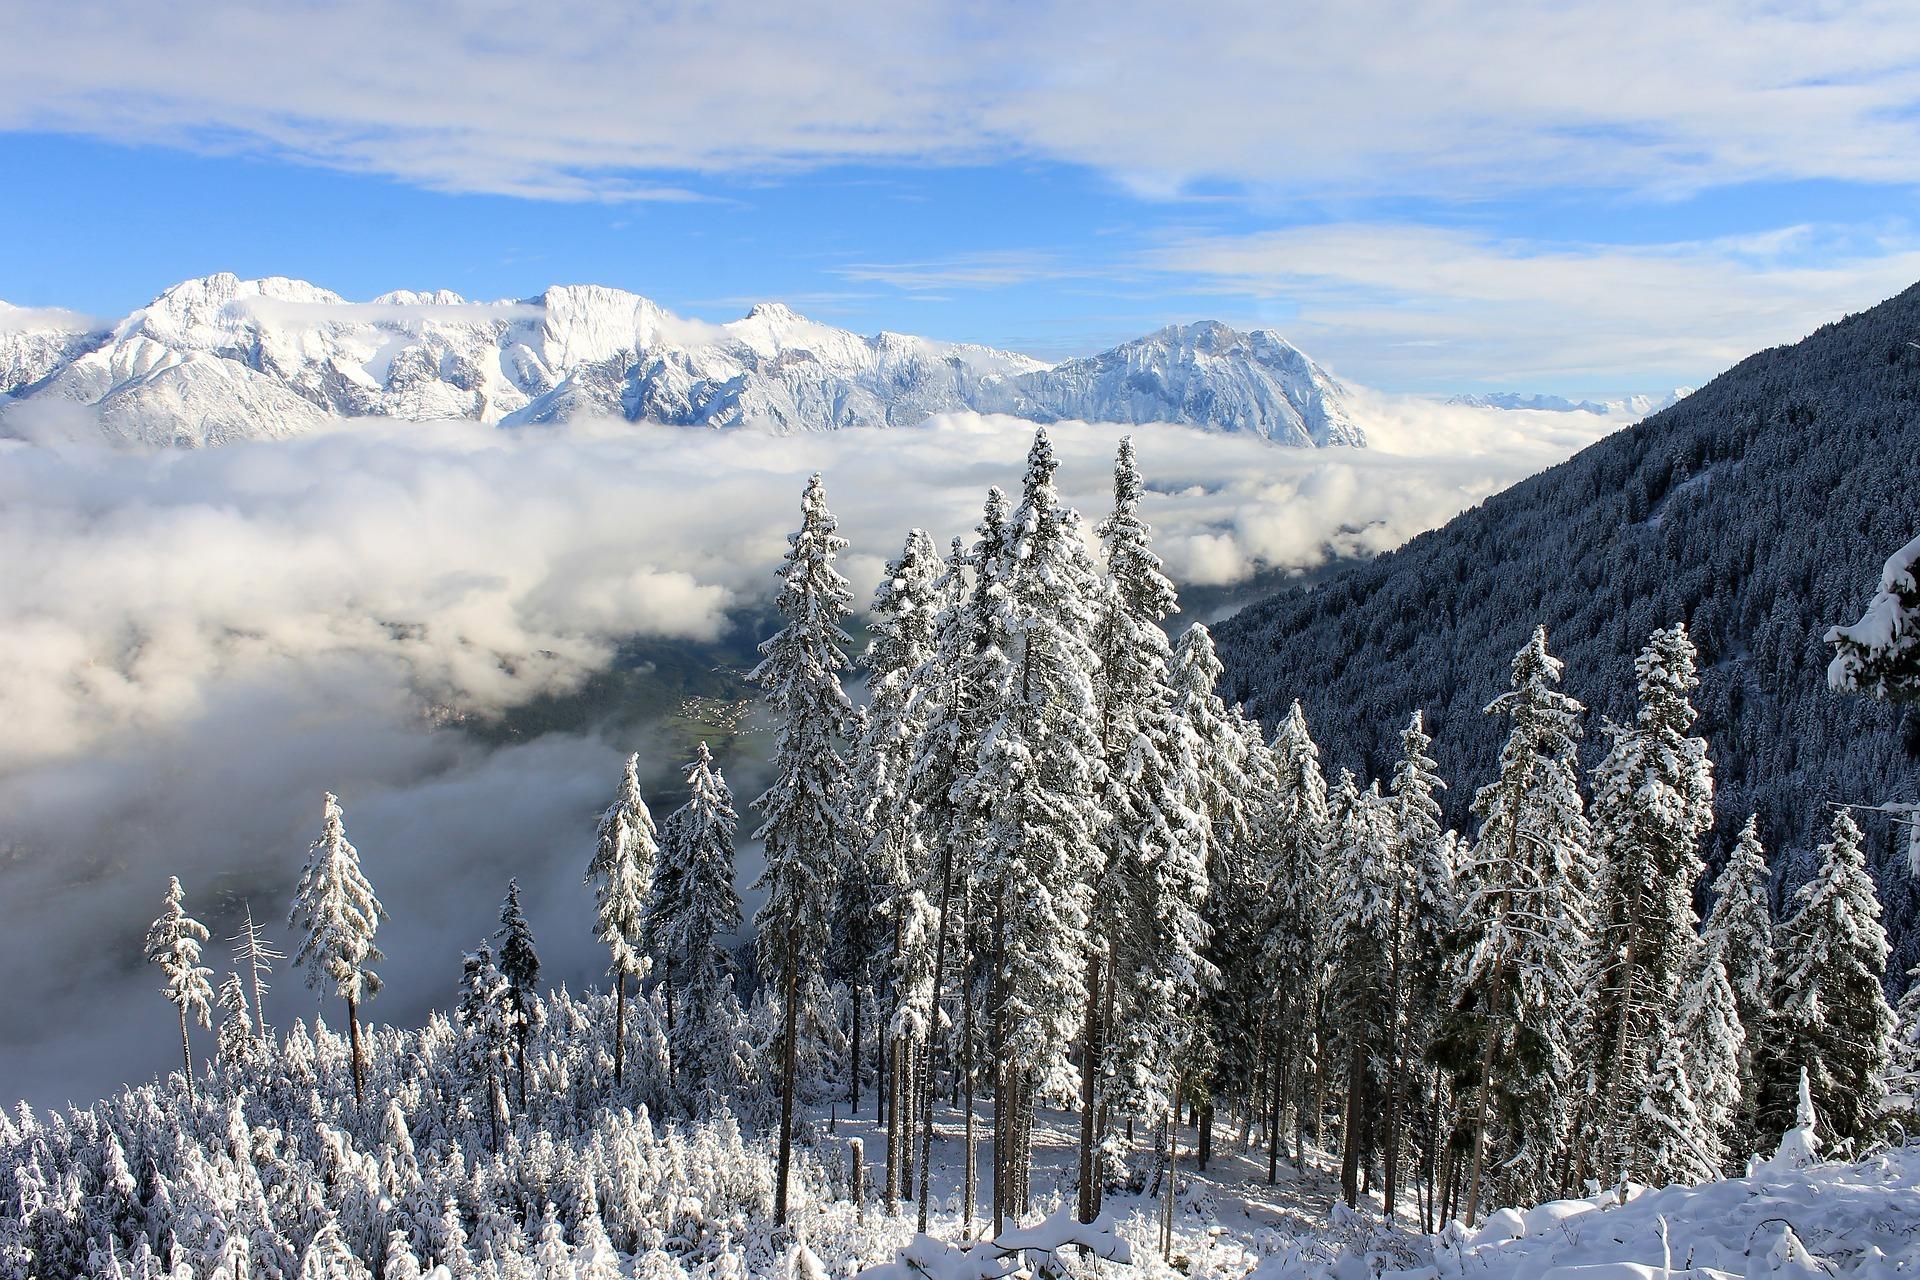 Wintergebirge ilyessuti Pixabay